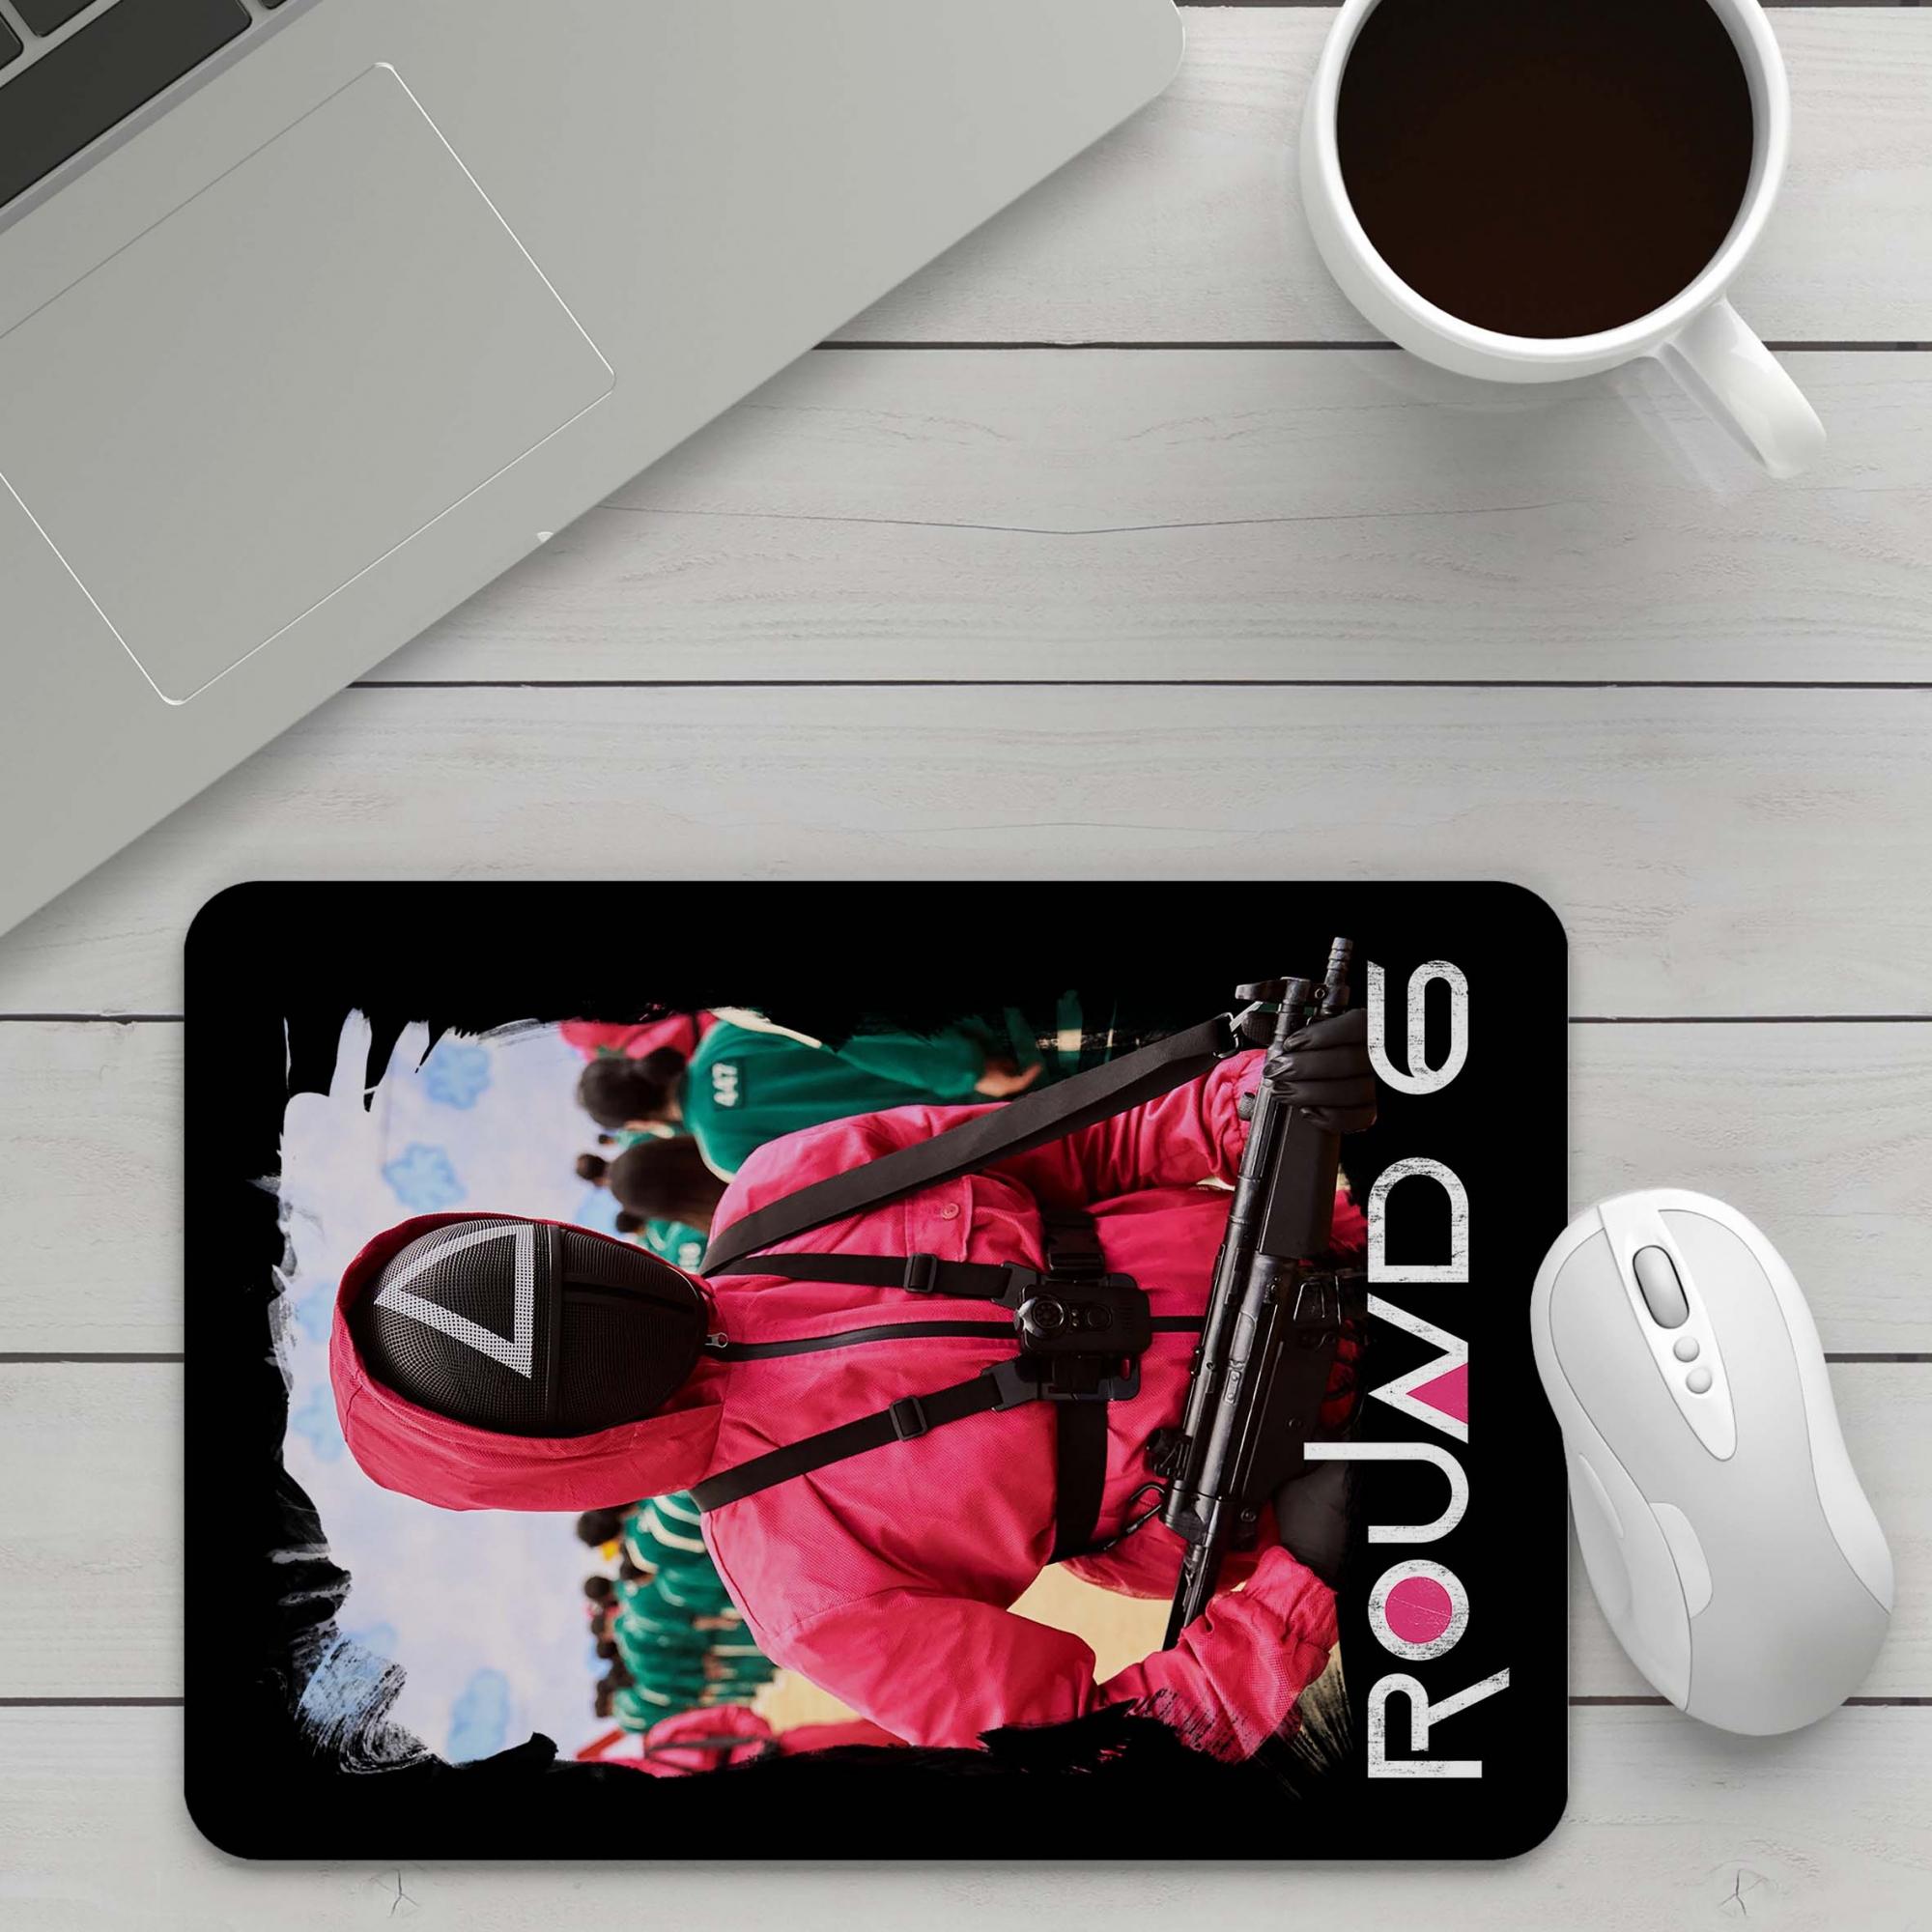 Mousepad Round 6 Squid Game Netflix - EV